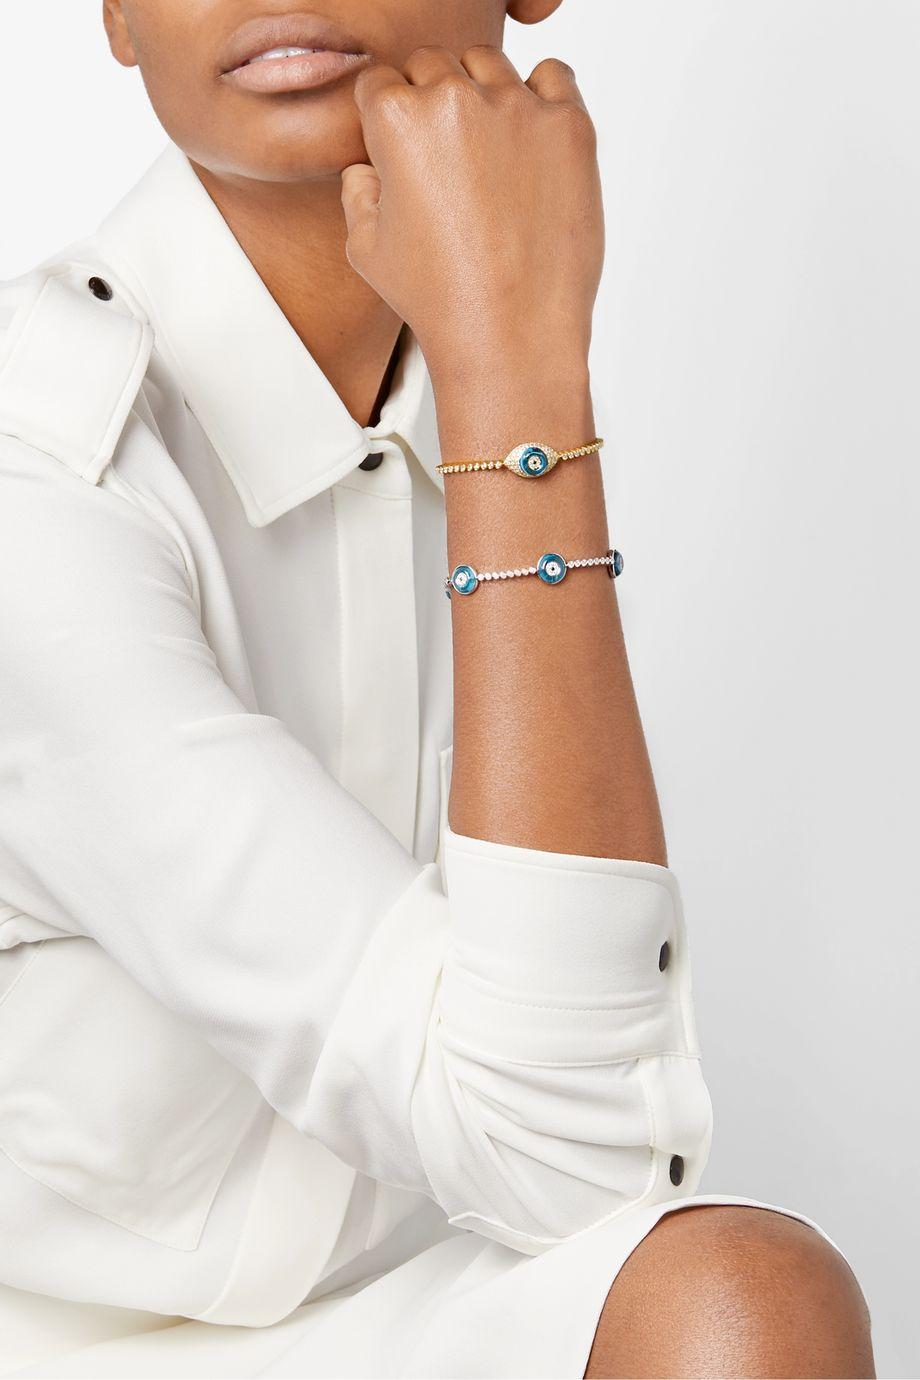 Lorraine Schwartz 18-karat gold multi-stone bracelet